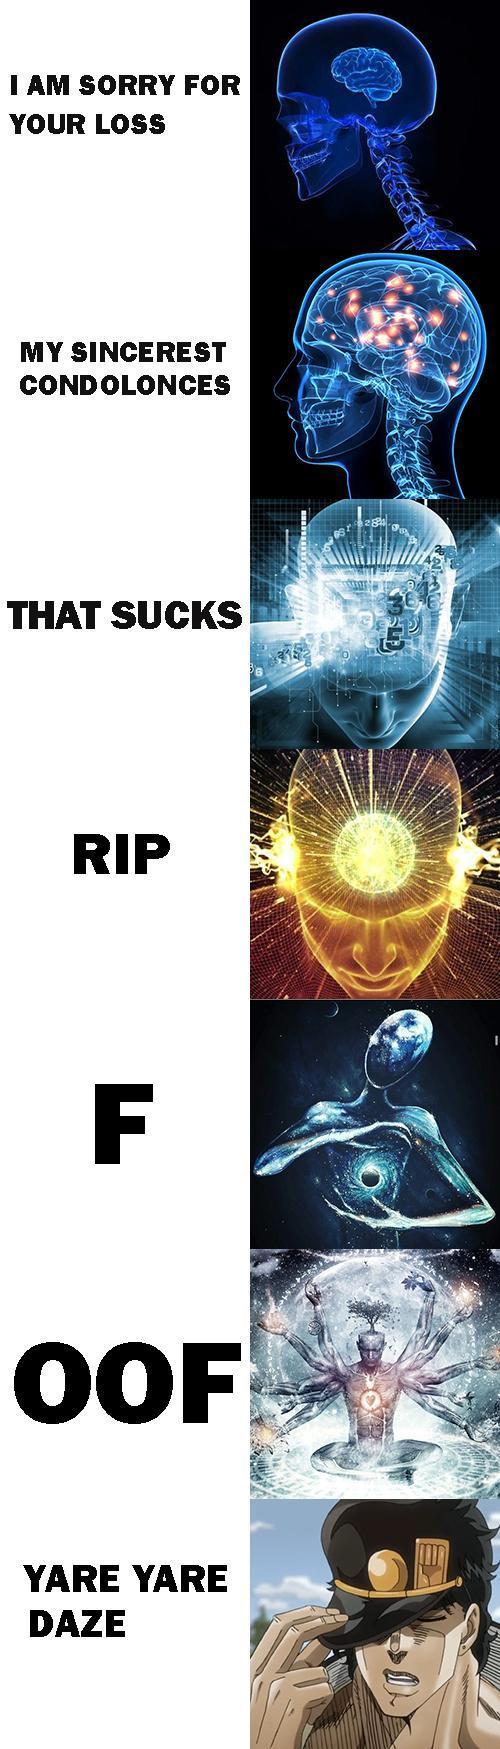 Howdy gamers - meme